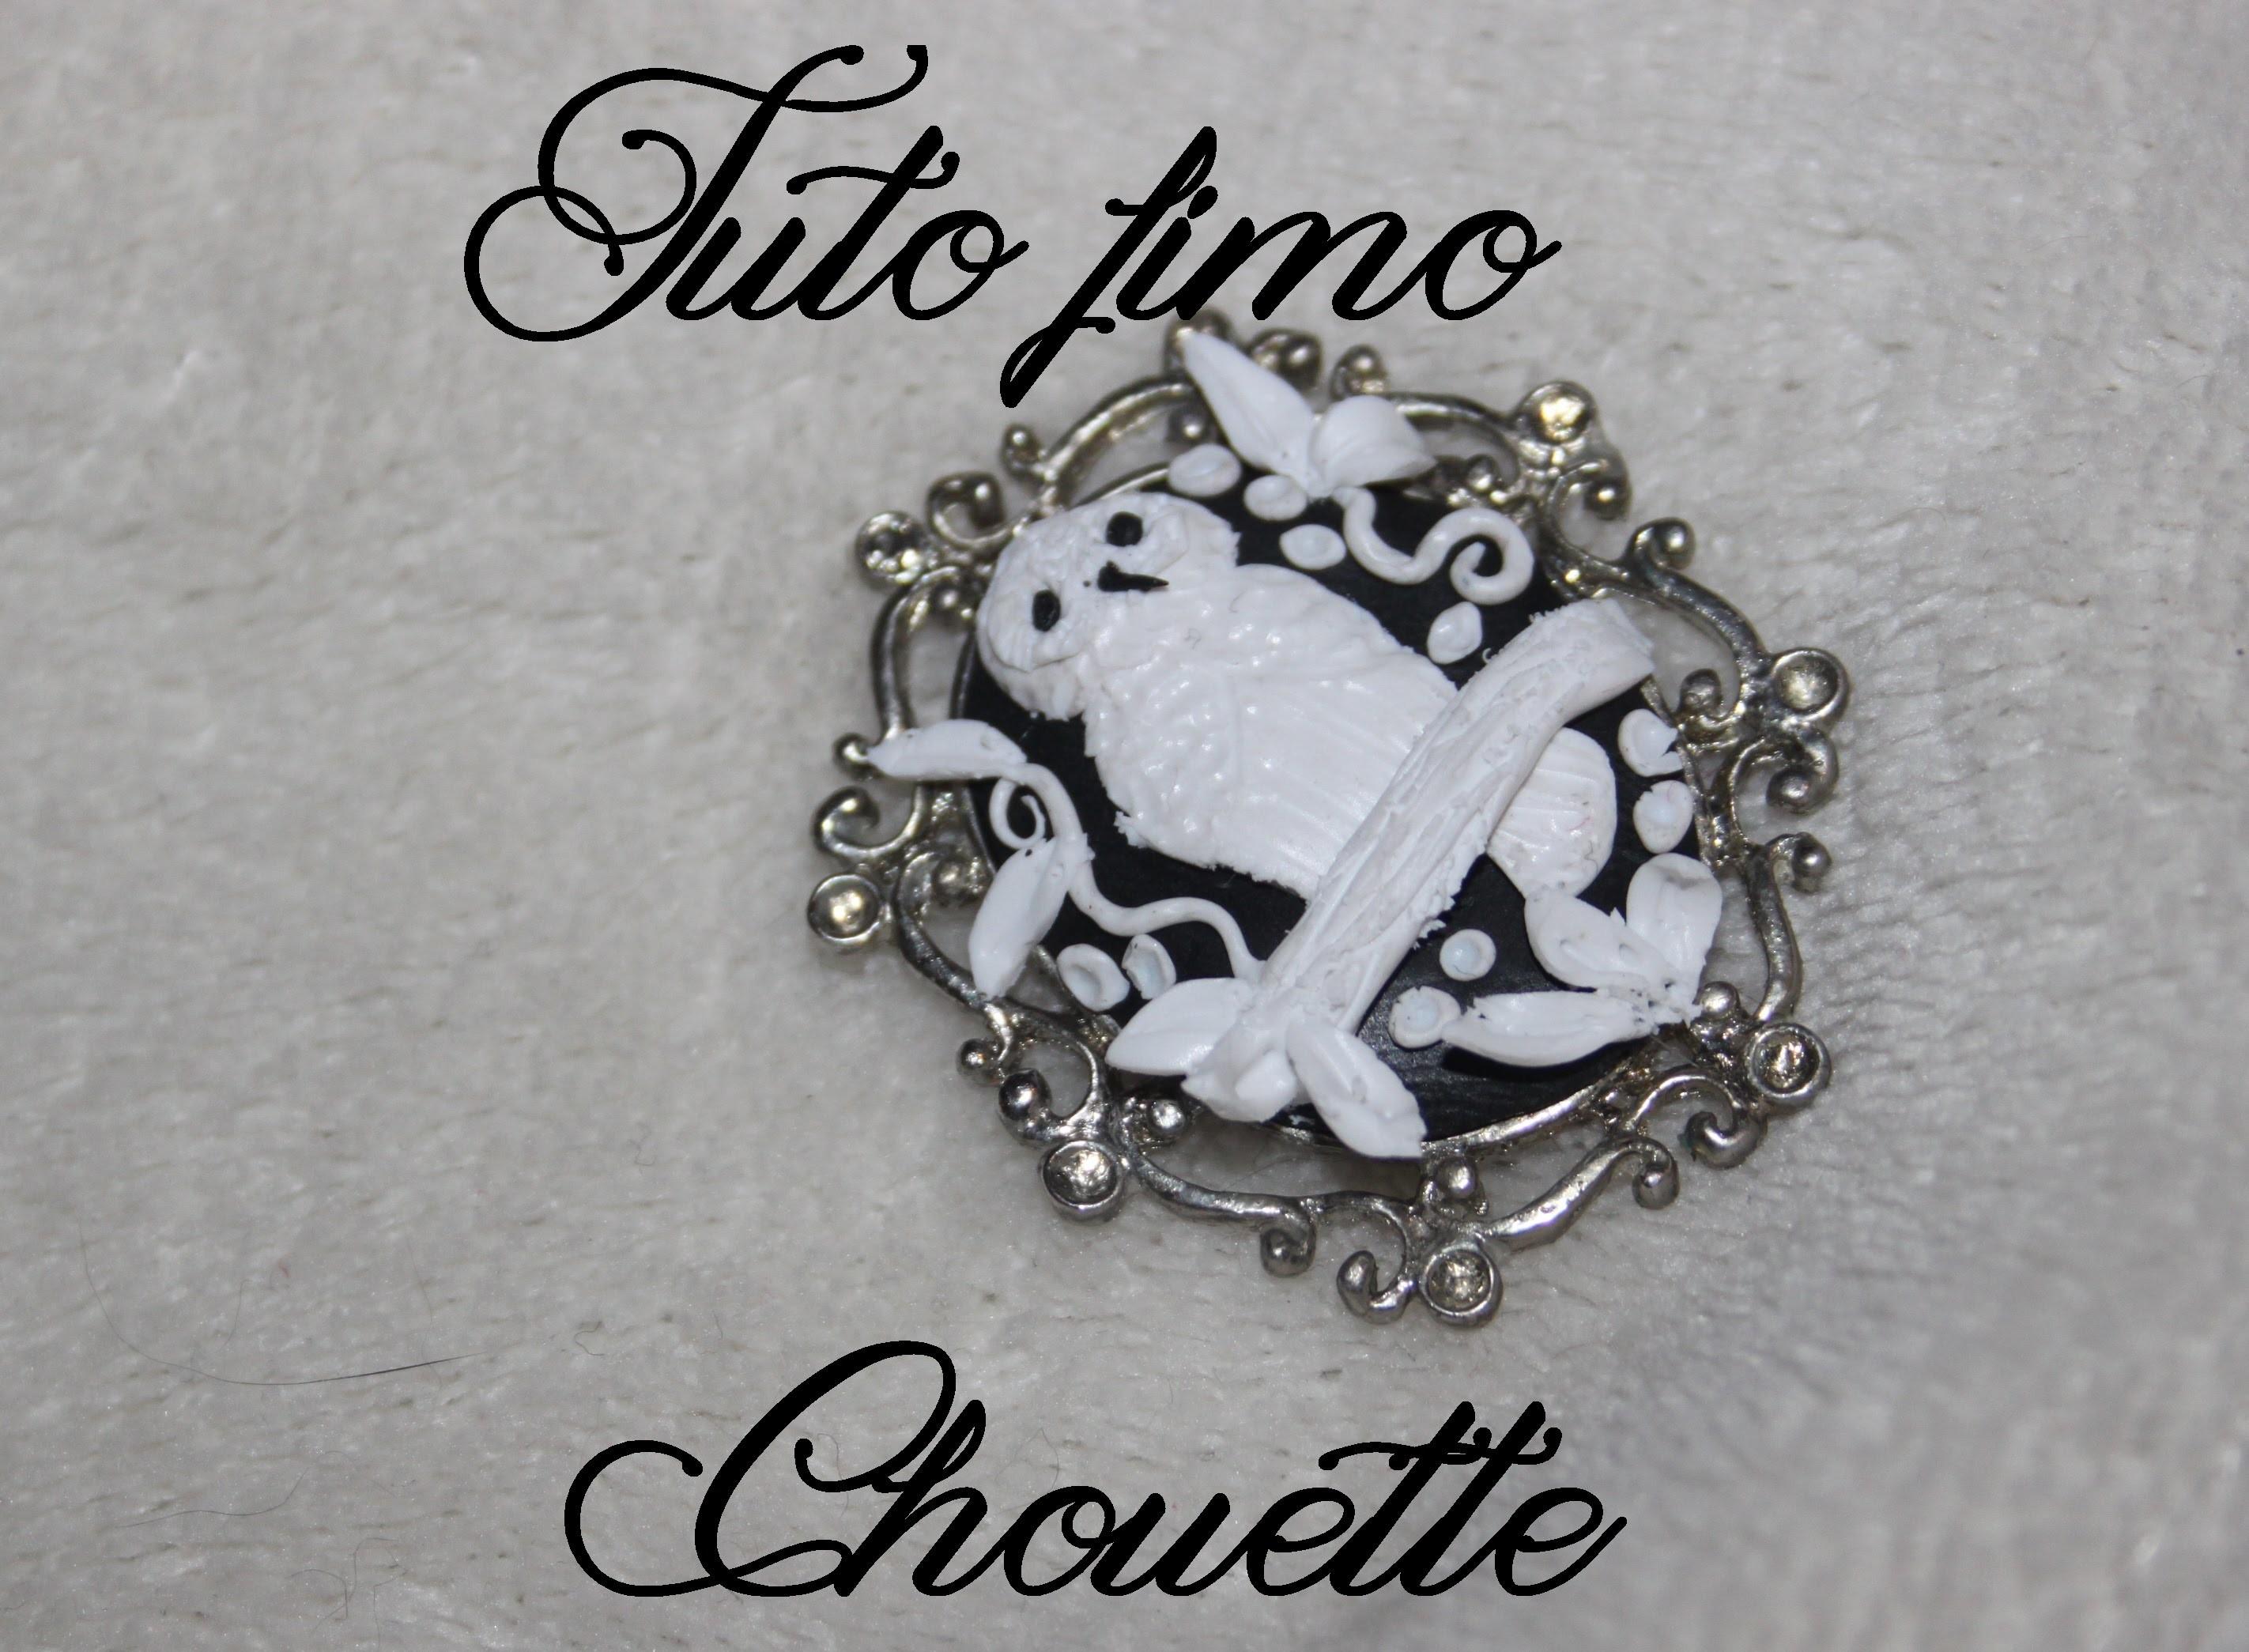 [♥ Tuto Fimo camé chouette ♥]  ✿ Polymer clay cameo owl ✿